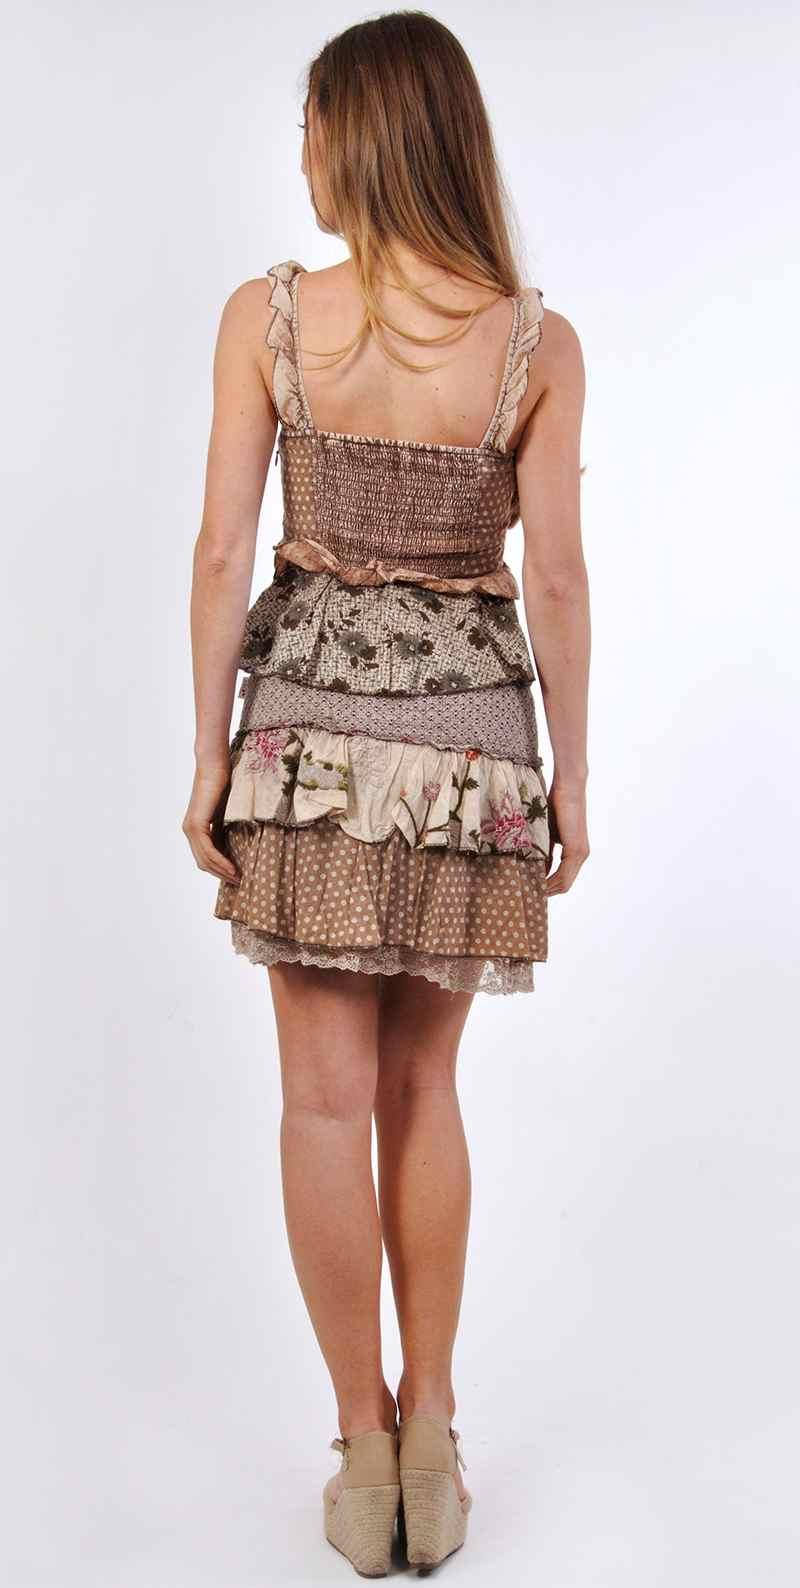 Savage Culture Dress Alba 28053 Ruffled Short Dress